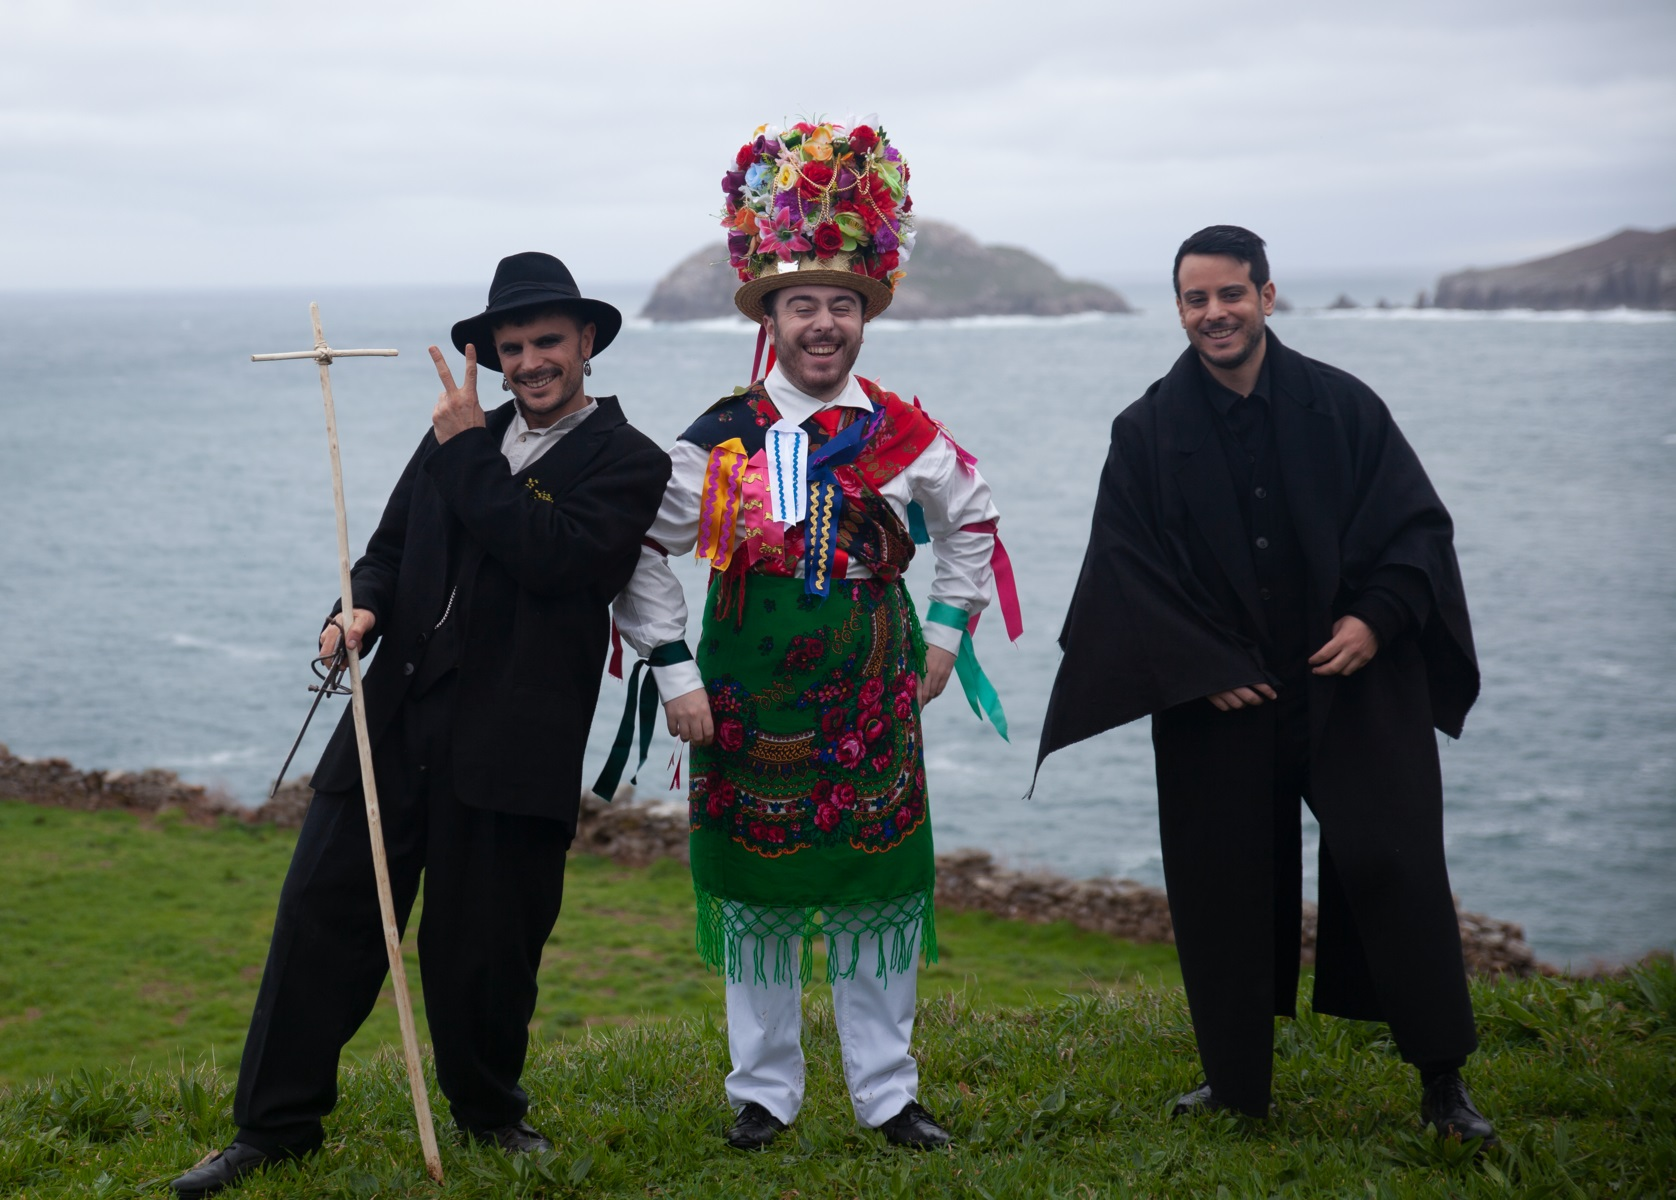 Xove, escenario de Veleno, o último videoclip de Baiuca